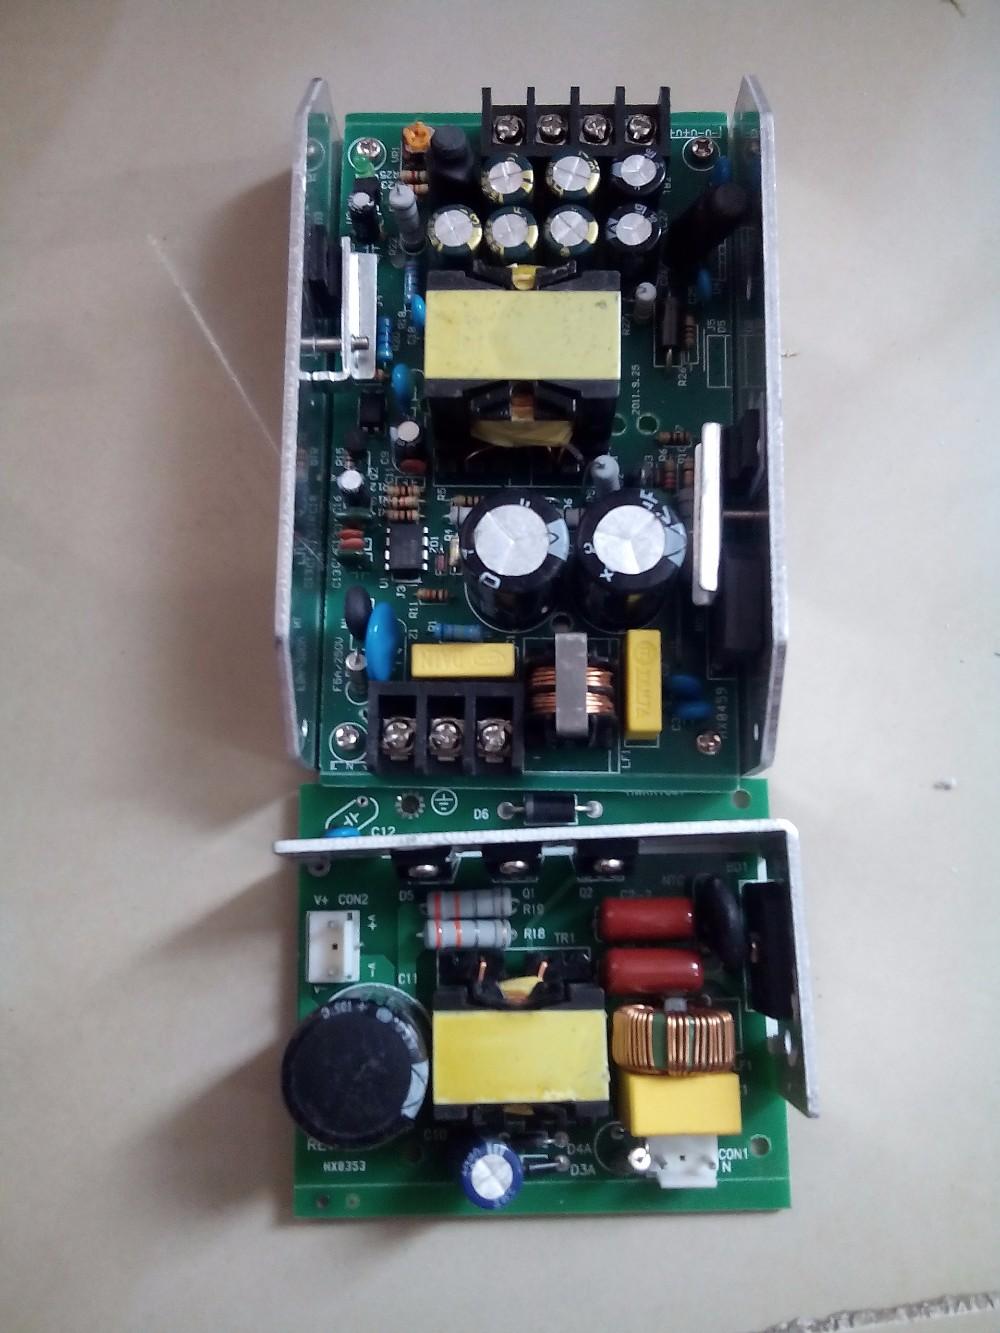 HTB16uK7LXXXXXanaFXXq6xXFXXXt - Stage Light Moving Head Beam Ignition Ignitor Booster Match Power Supply Power Source